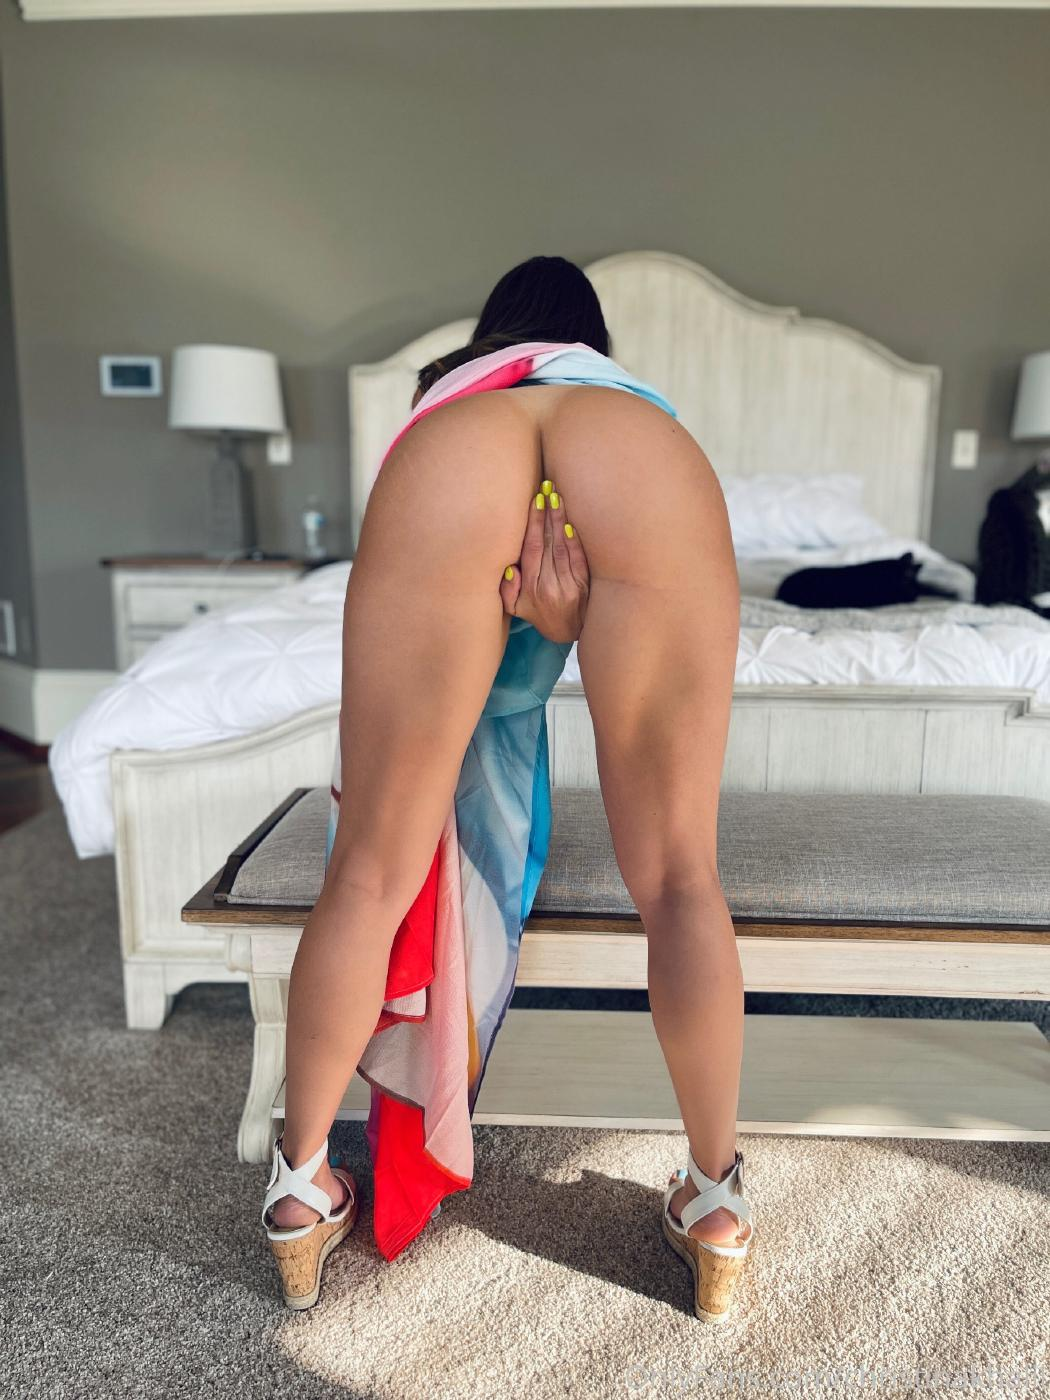 Christina Khalil Nipple And Pussy Tease Onlyfans Set Leaked Krnnpm